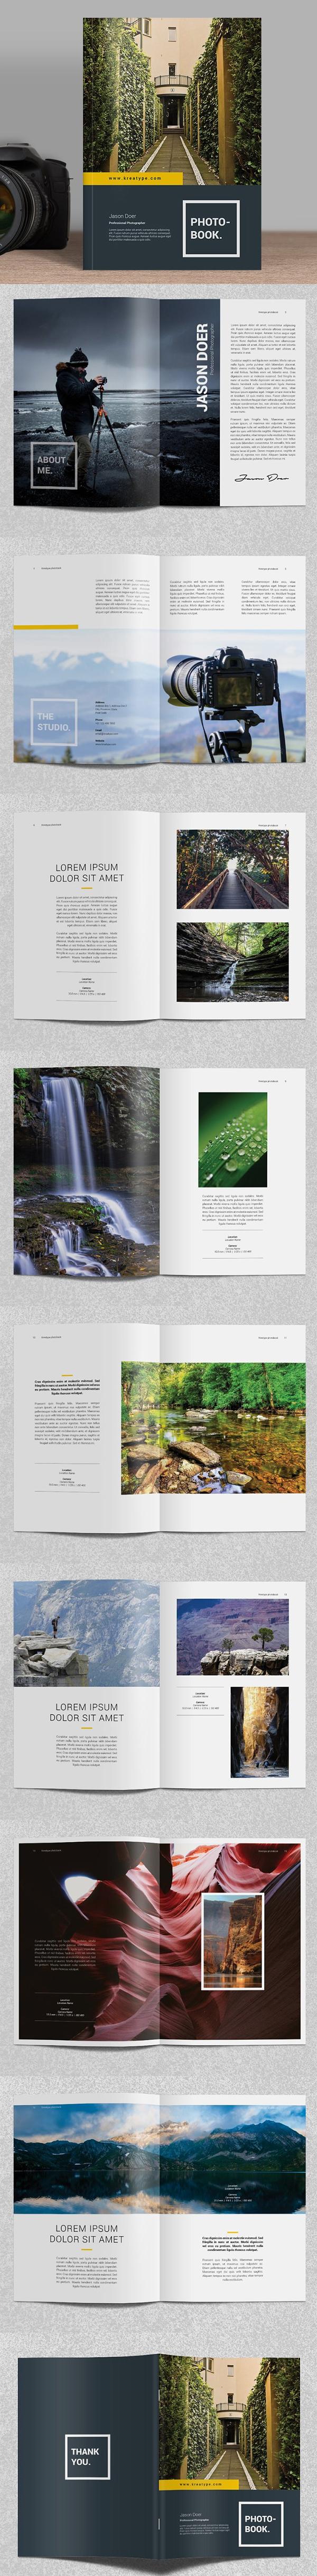 Kreatype Photobook